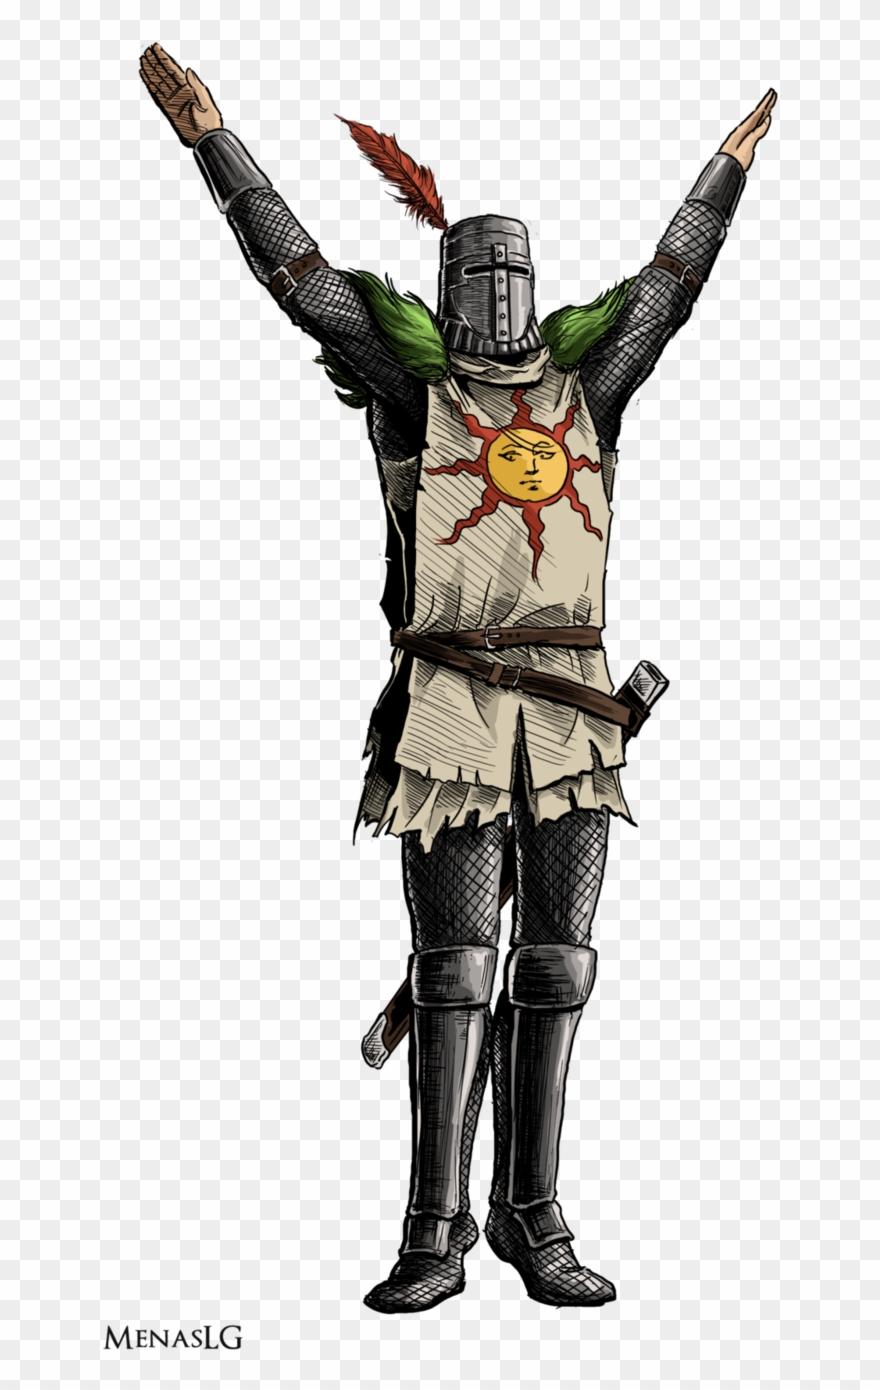 Dark Souls Solaire Transparent Png.